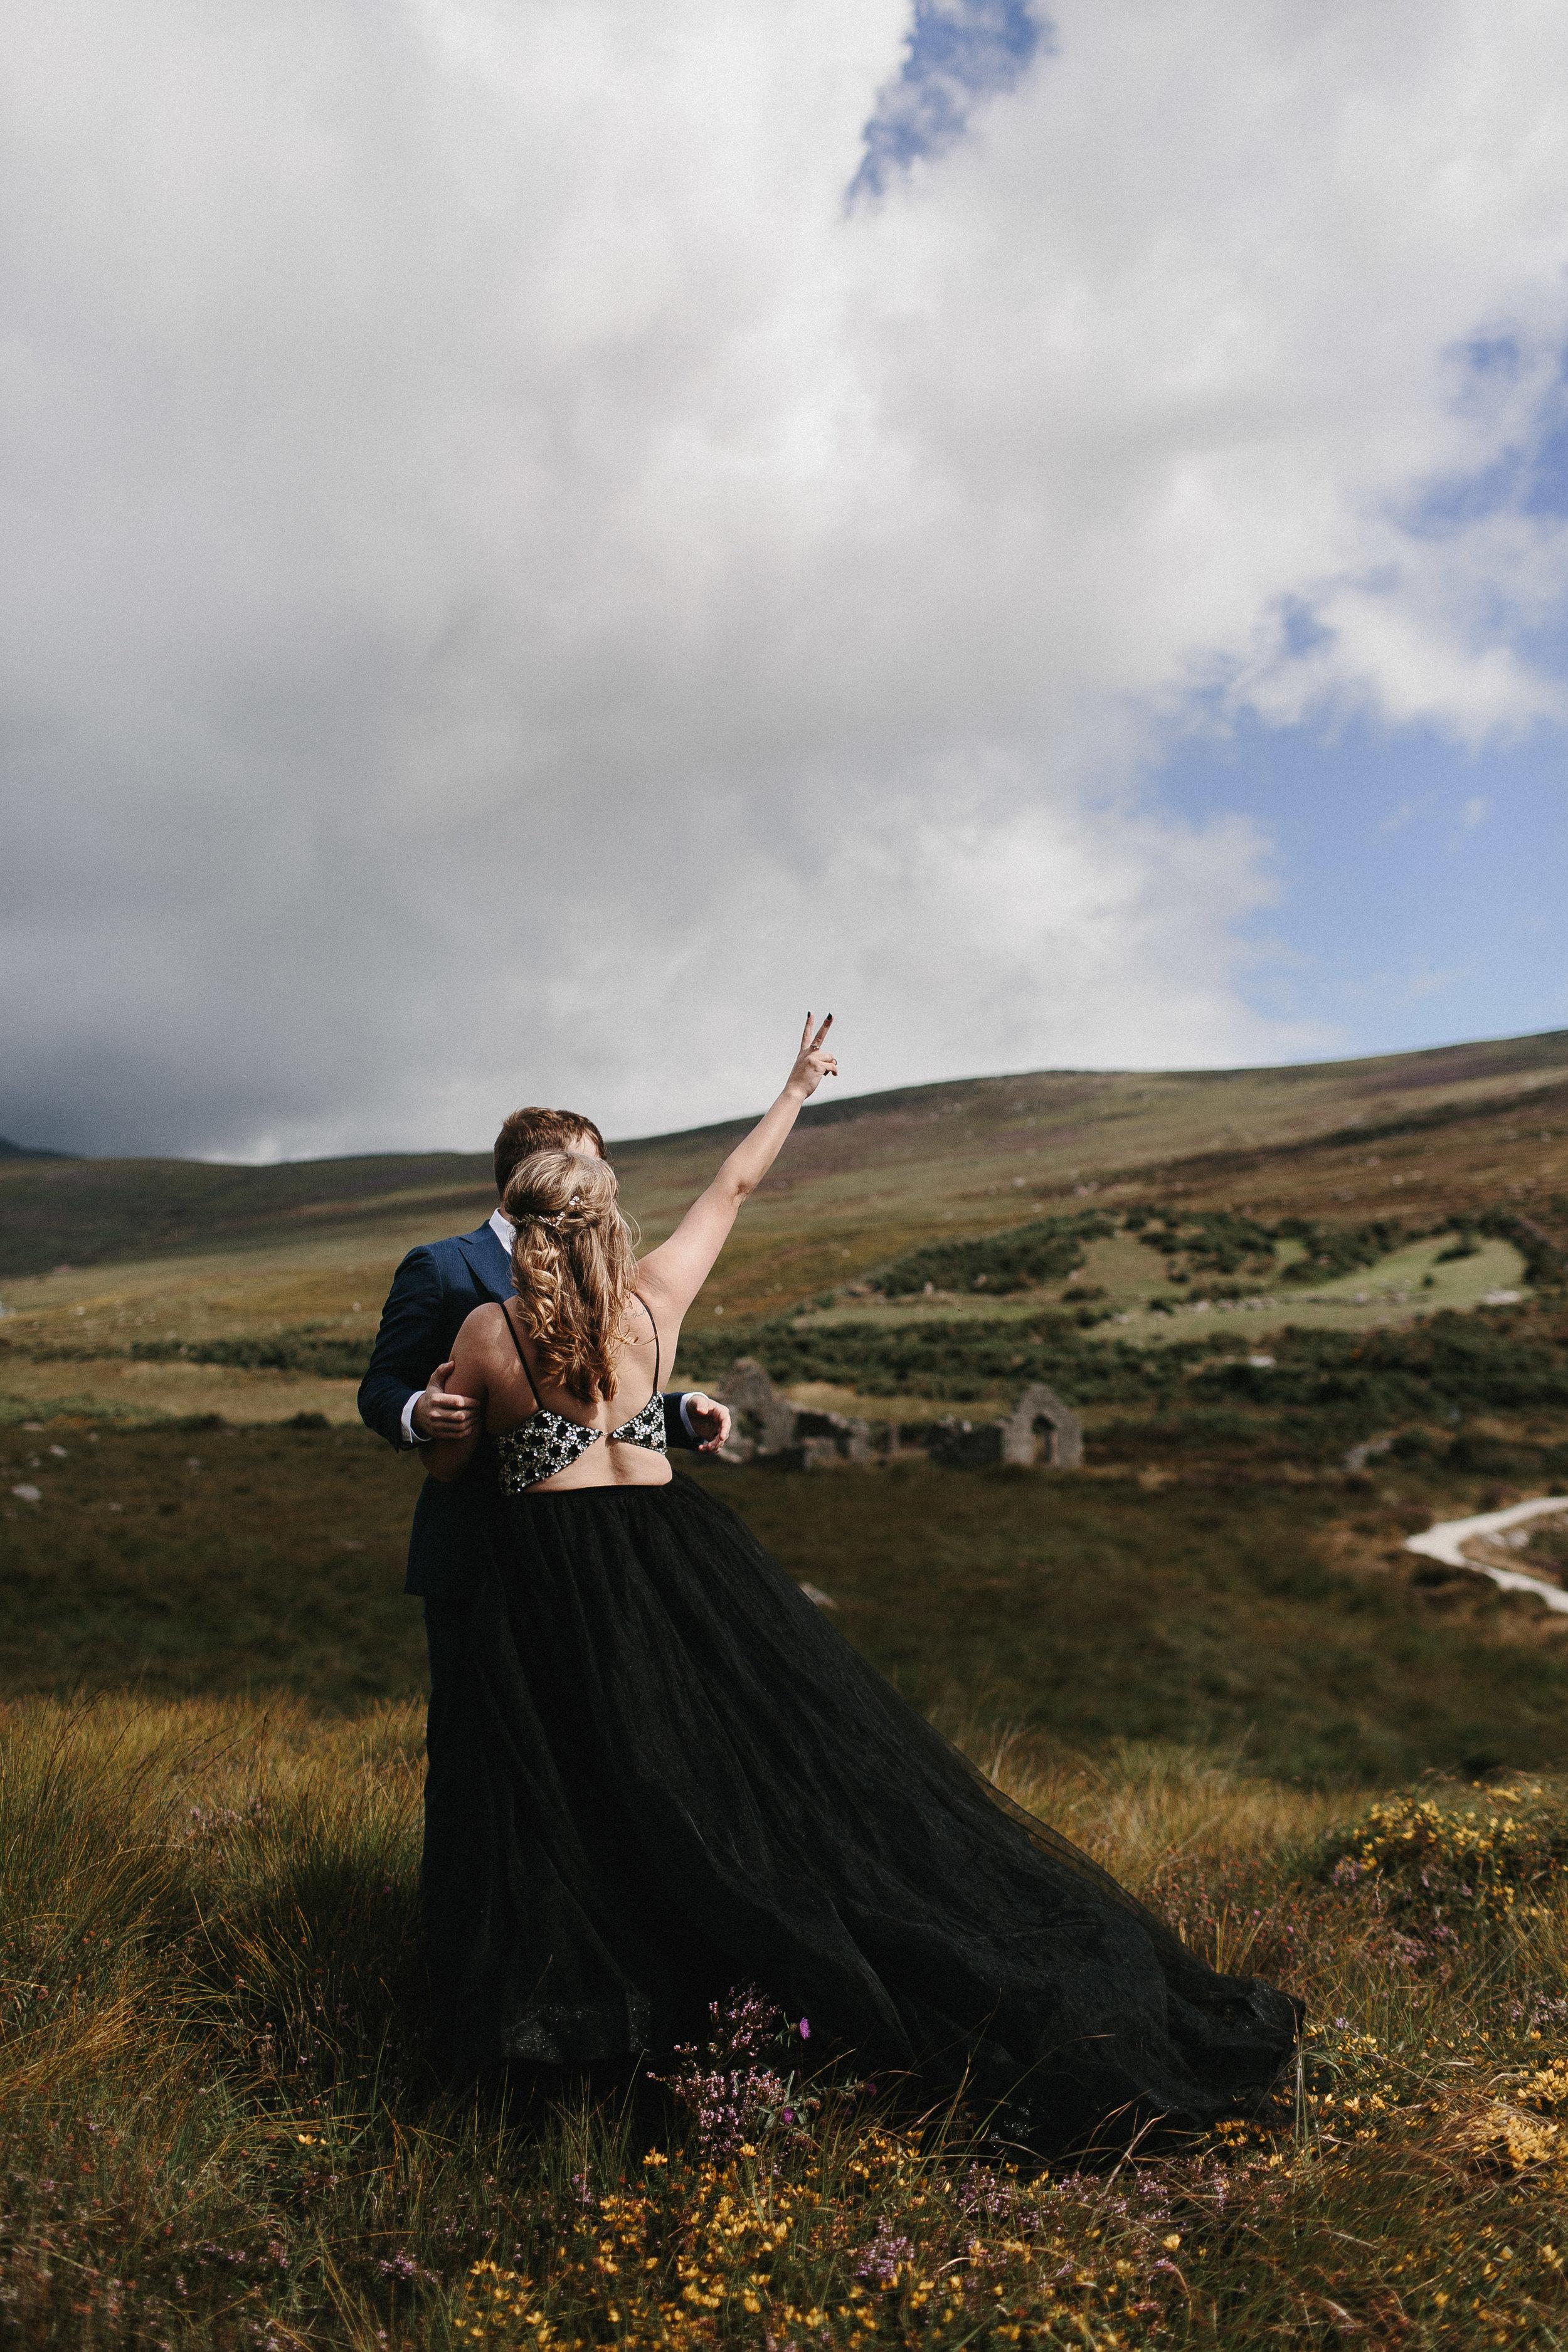 ireland_elopement_black_wedding_dress_wicklow_glendalough_athy_st_kevins_way_1270.jpg